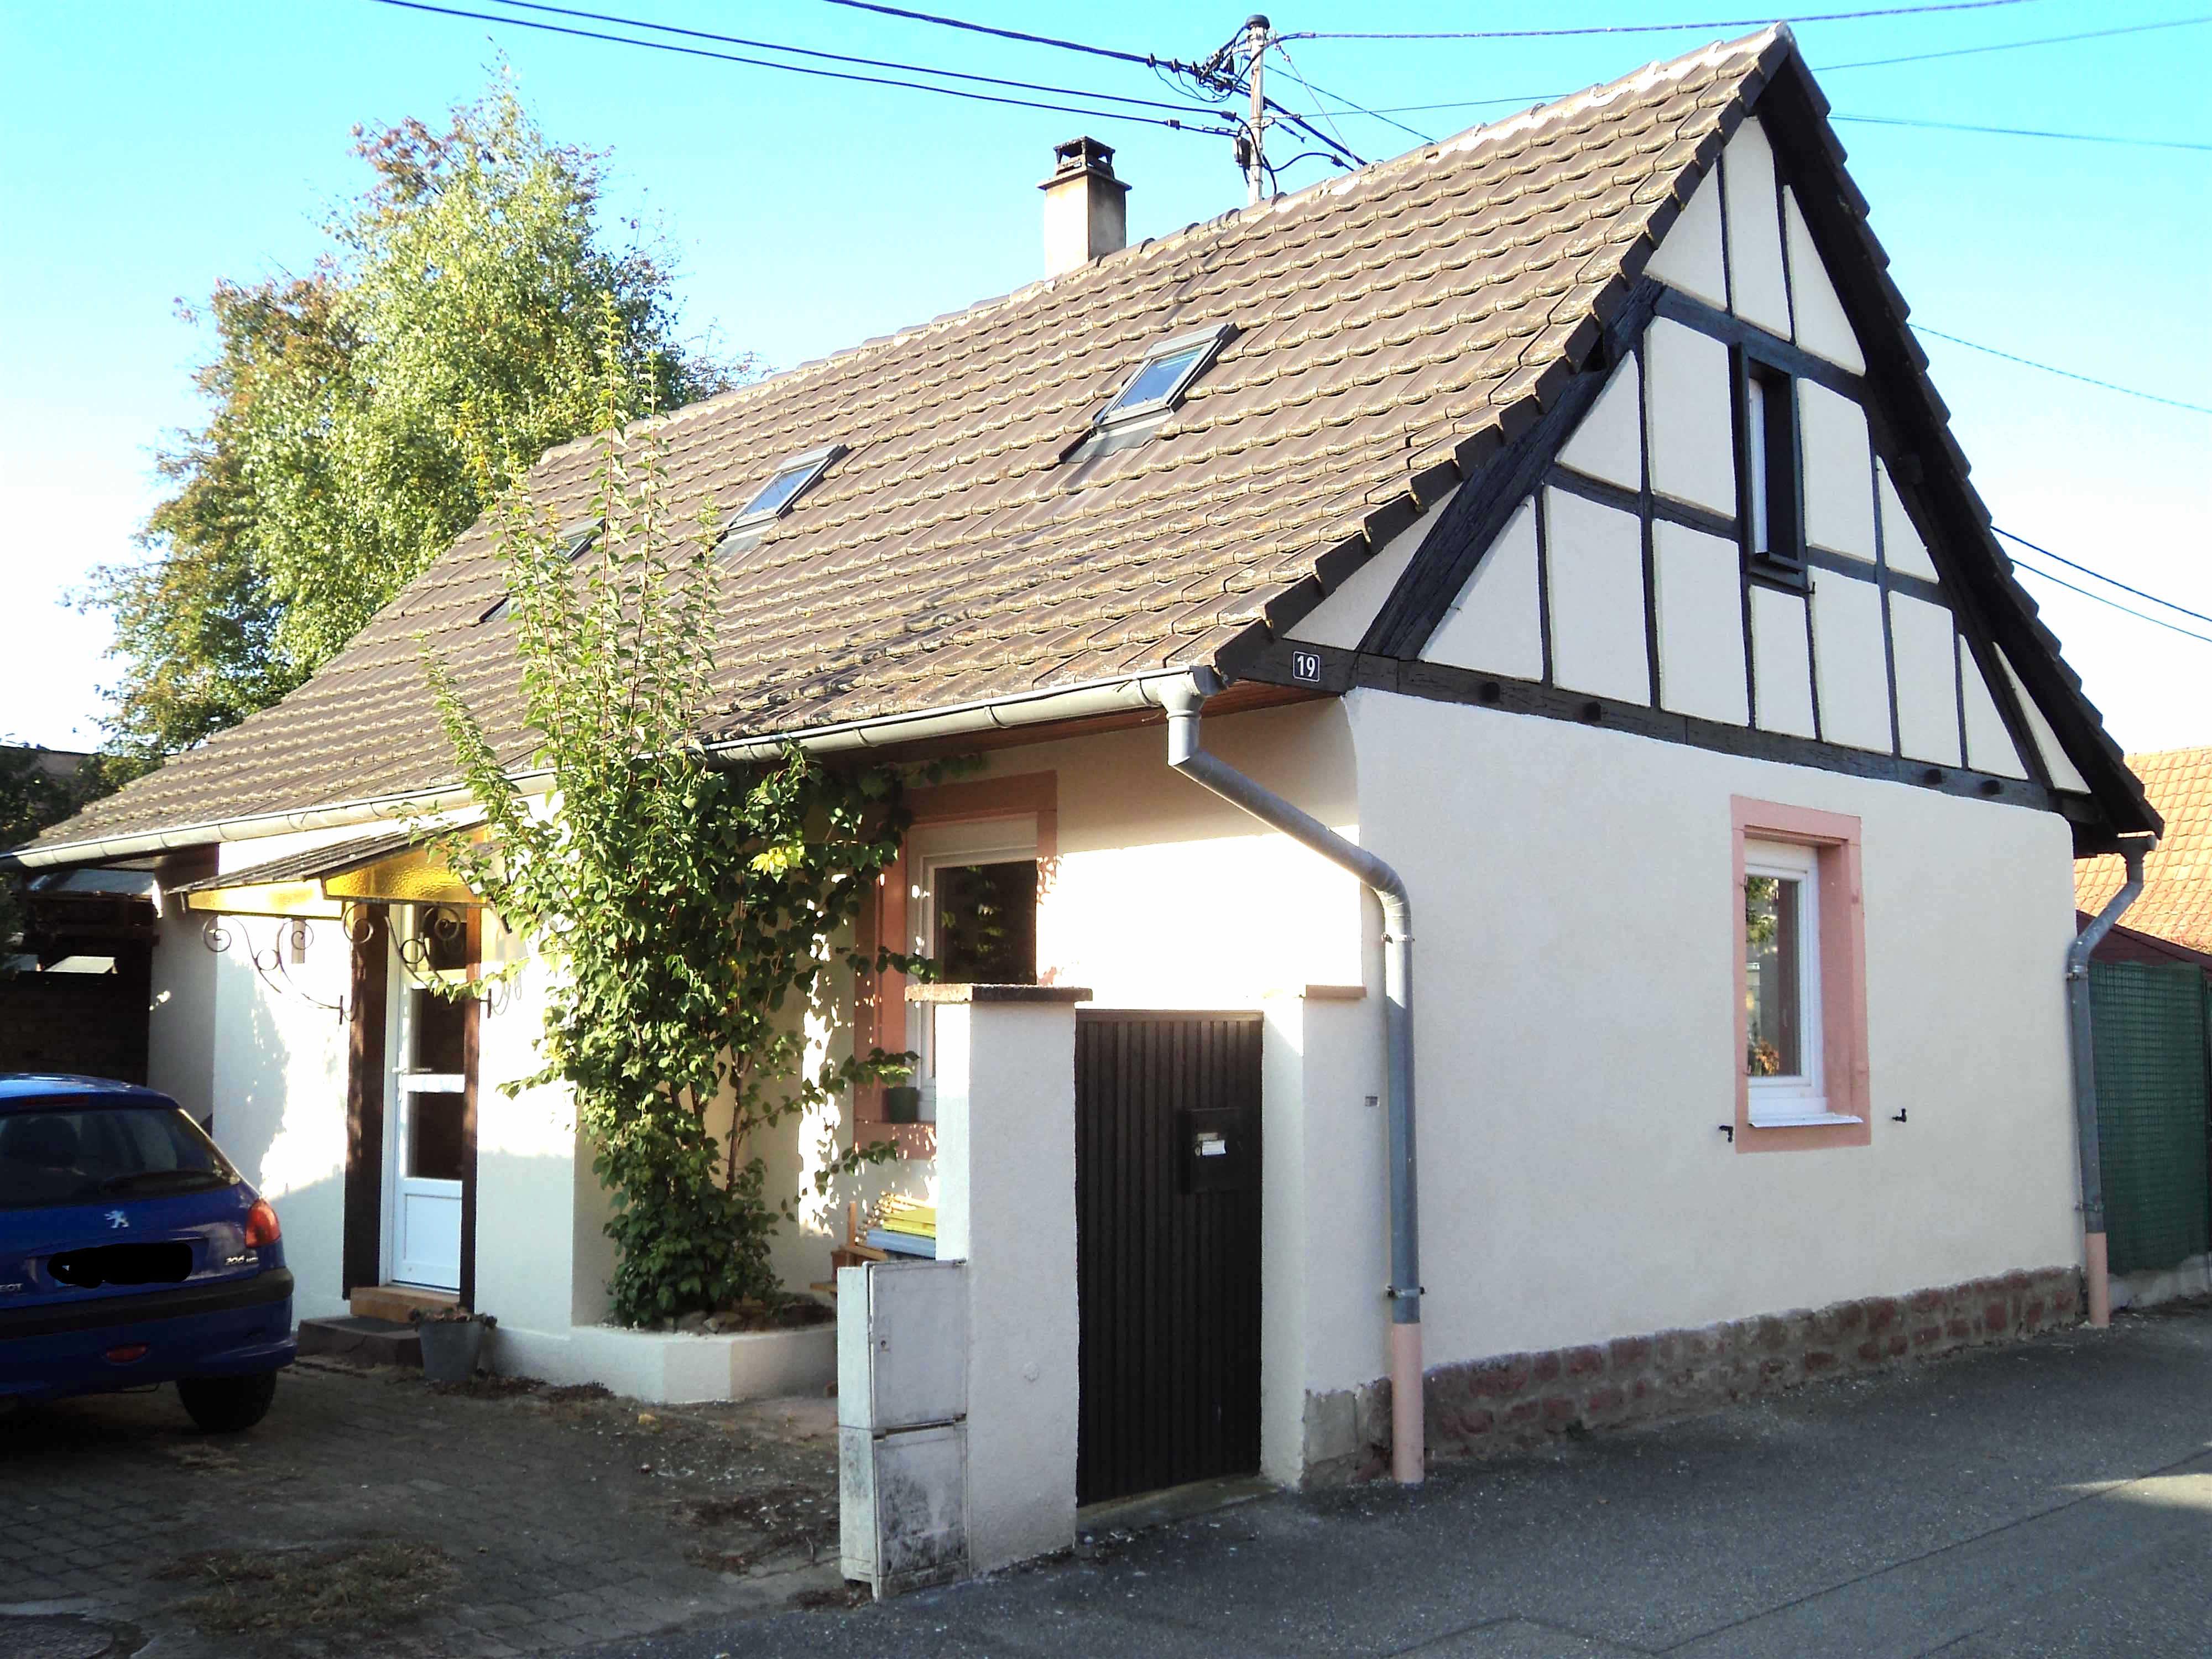 Ventes mais appart vente maison bas rhin artolsheim alsace bas rhin la br - Leboncoin immobilier bas rhin ...